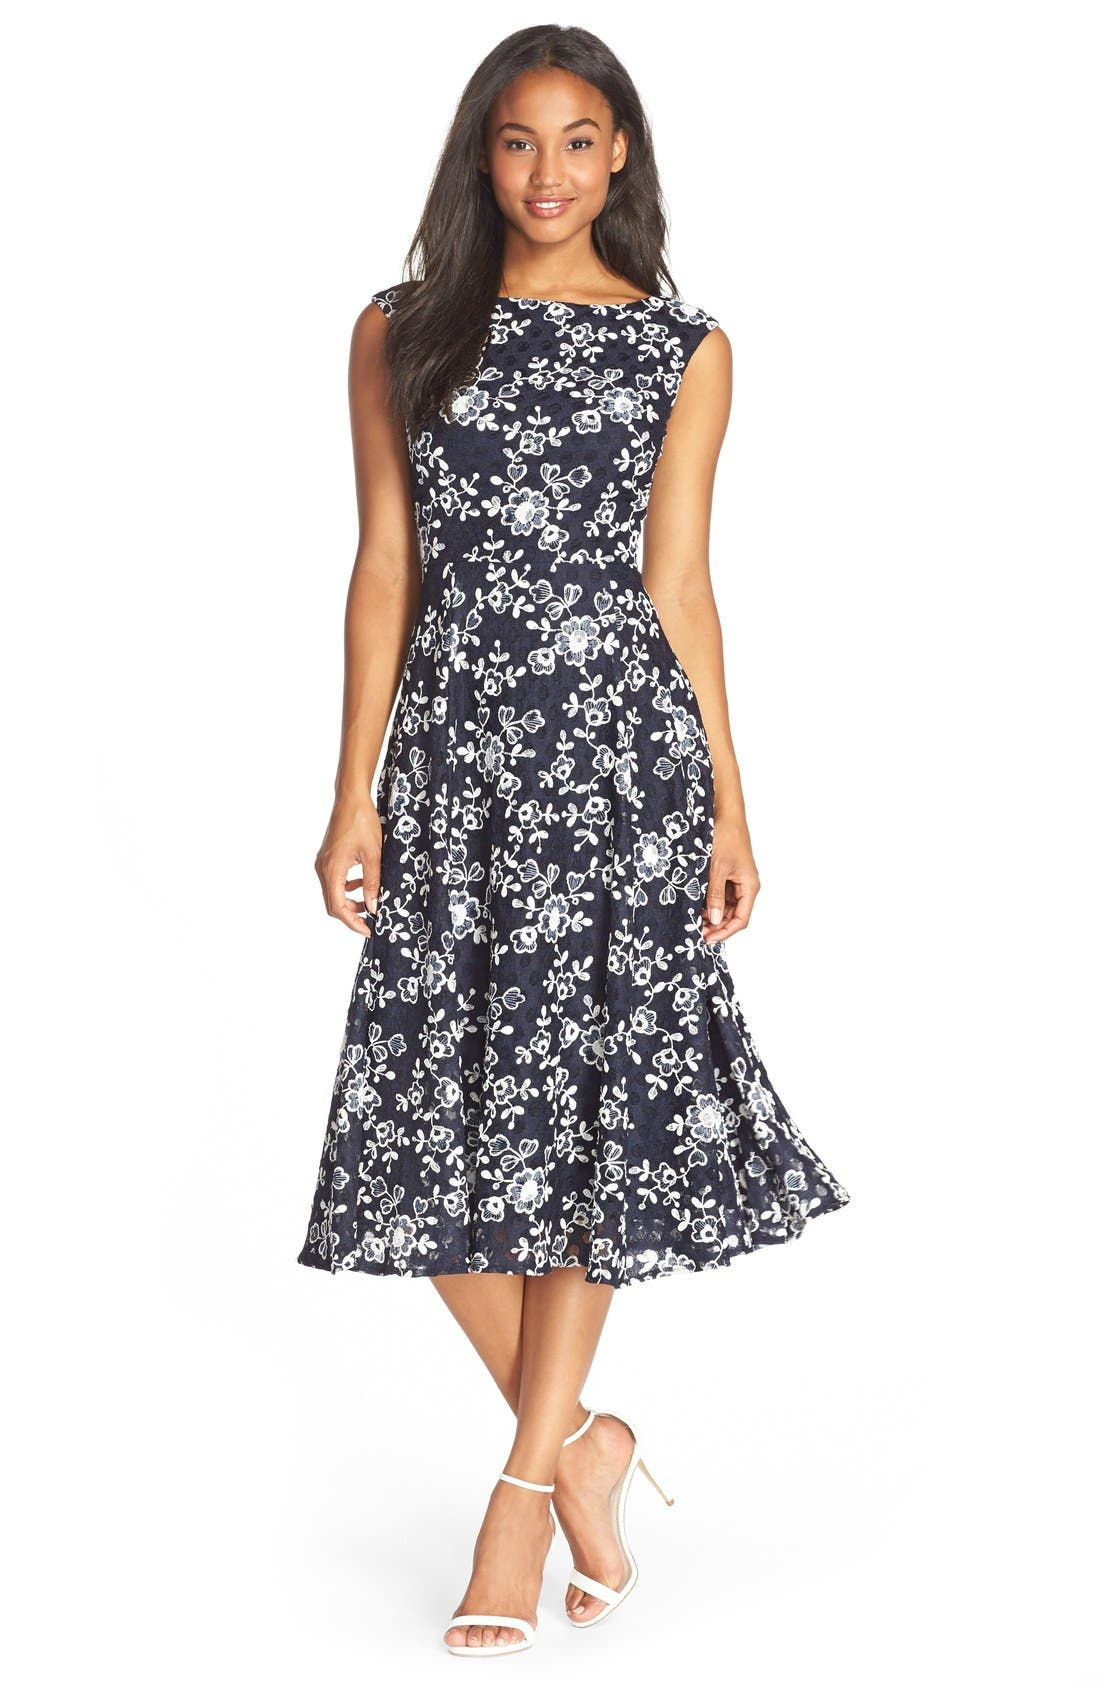 Alternate Image 1 Selected - Betsey Johnson Lace Midi Fit & Flare Dress